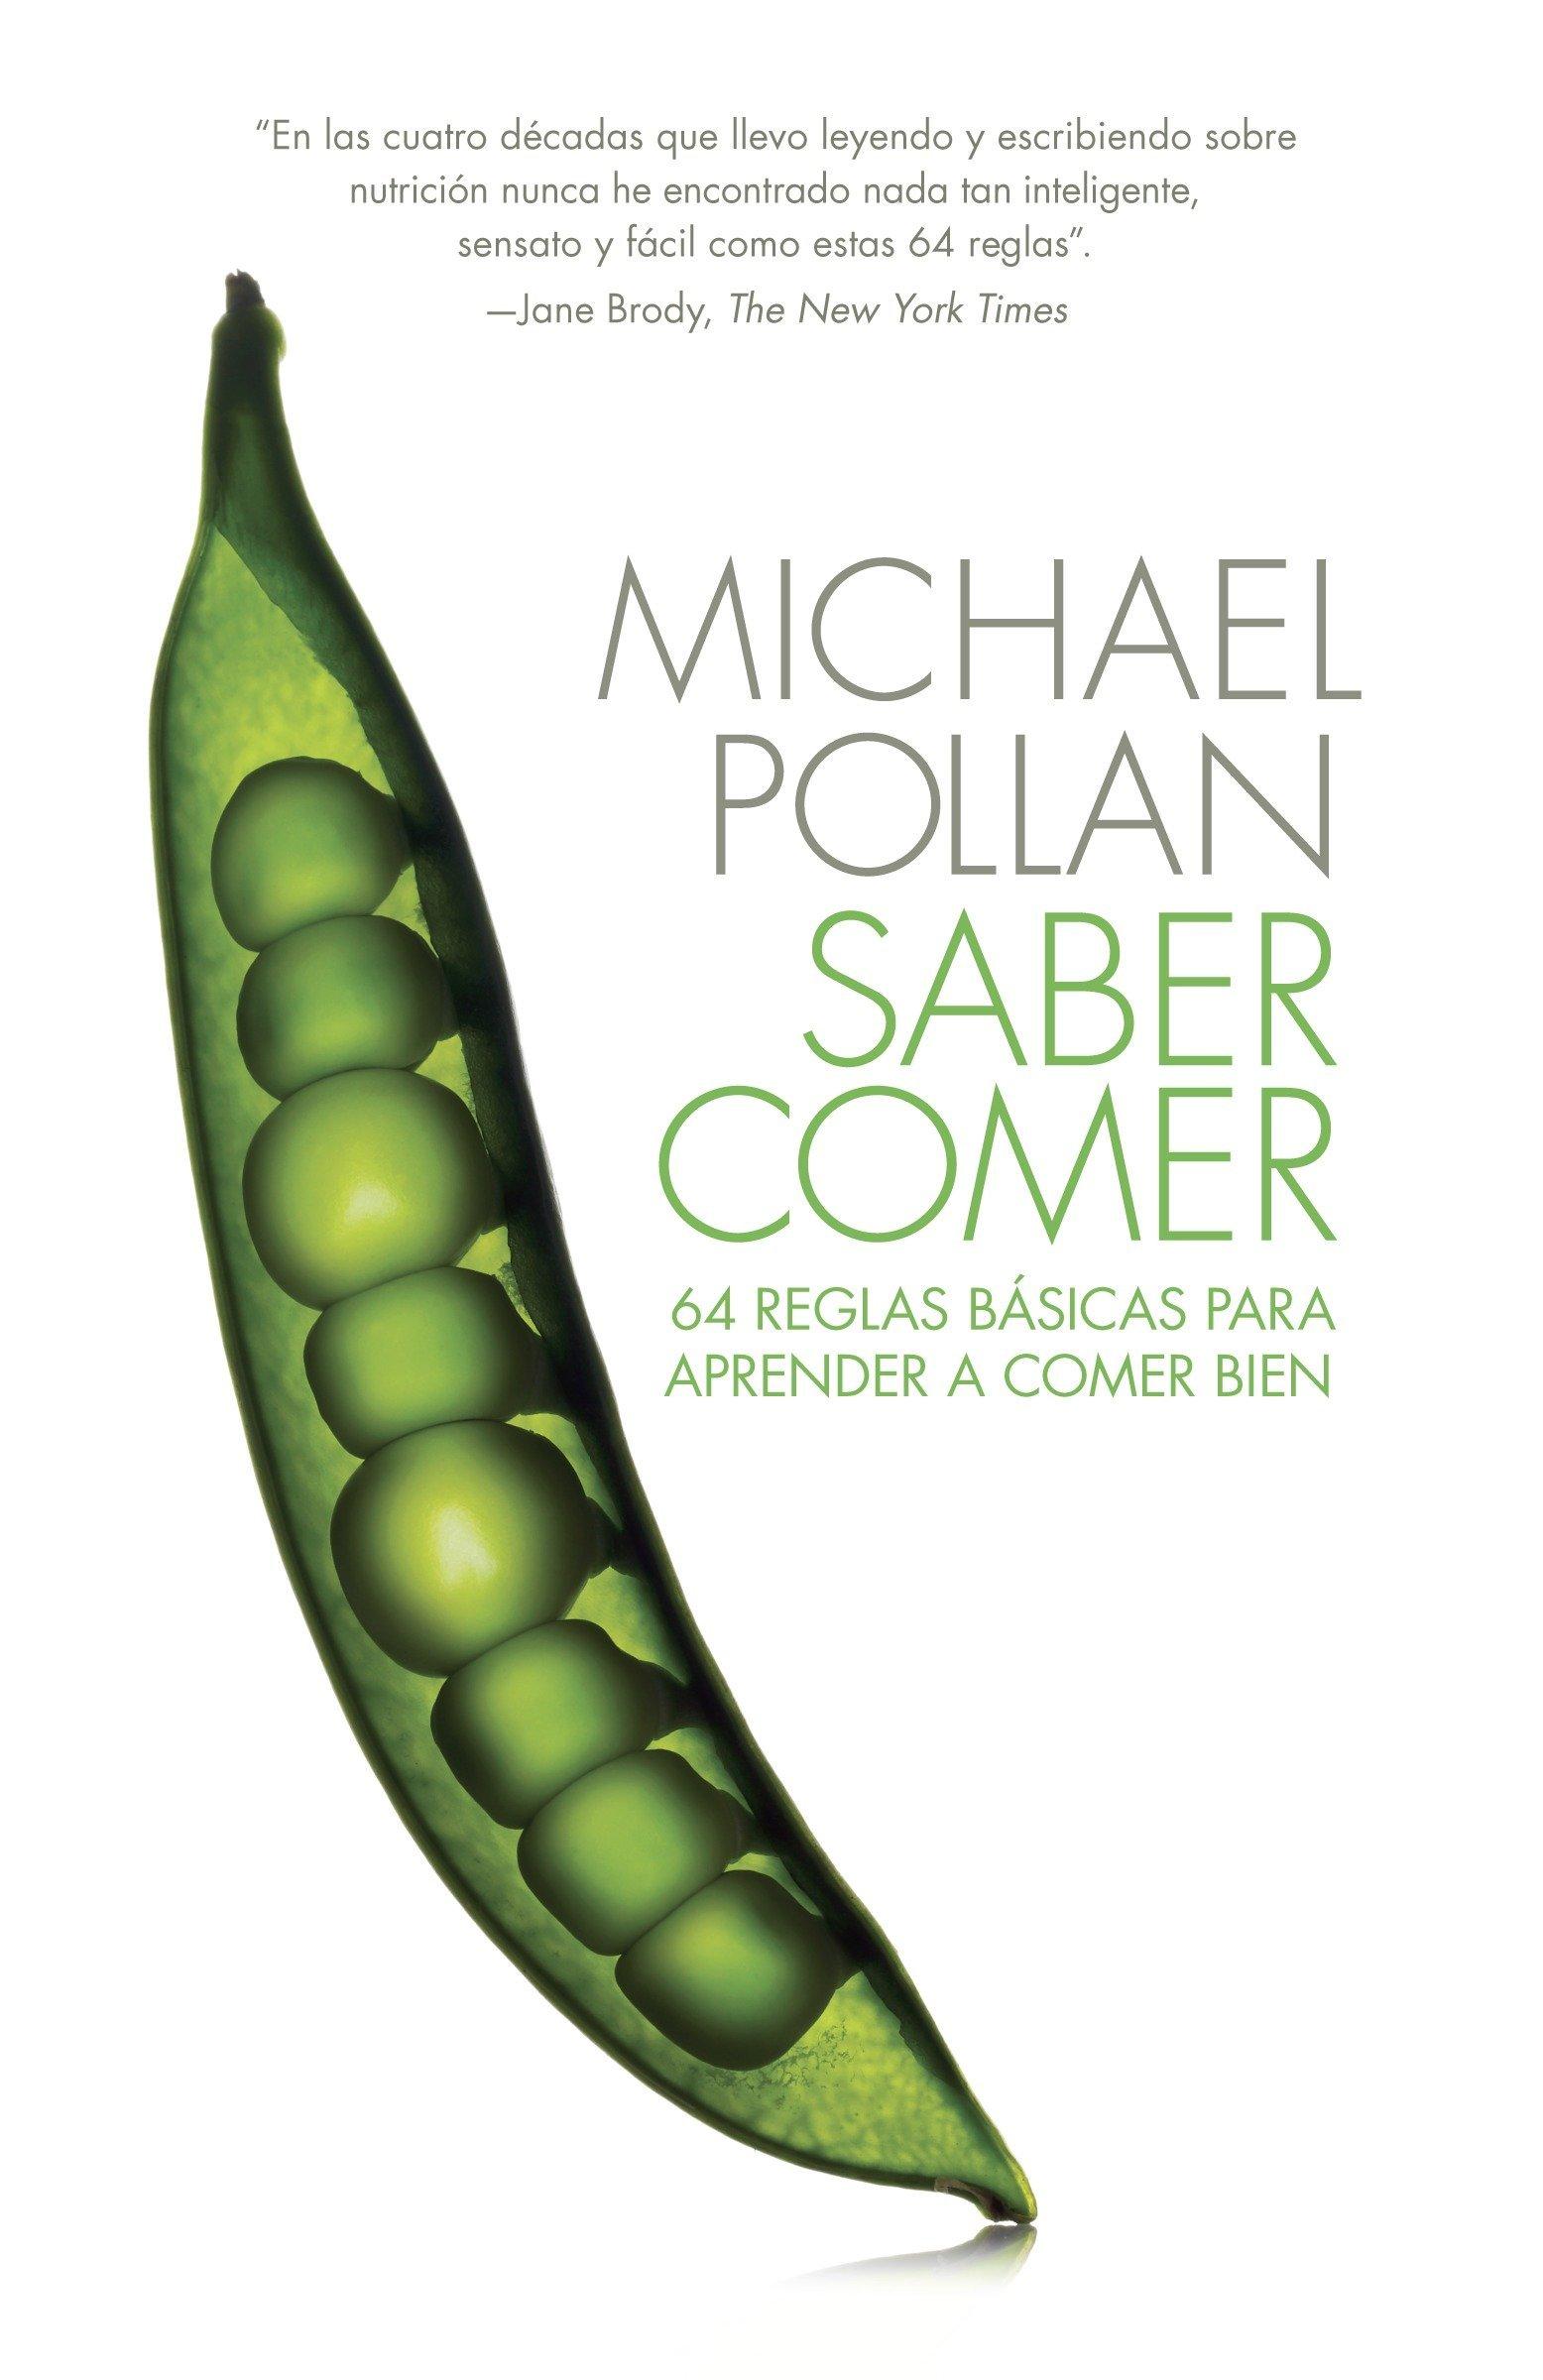 Saber comer: 64 reglas basicas para aprender a comer bien (Spanish Edition) PDF